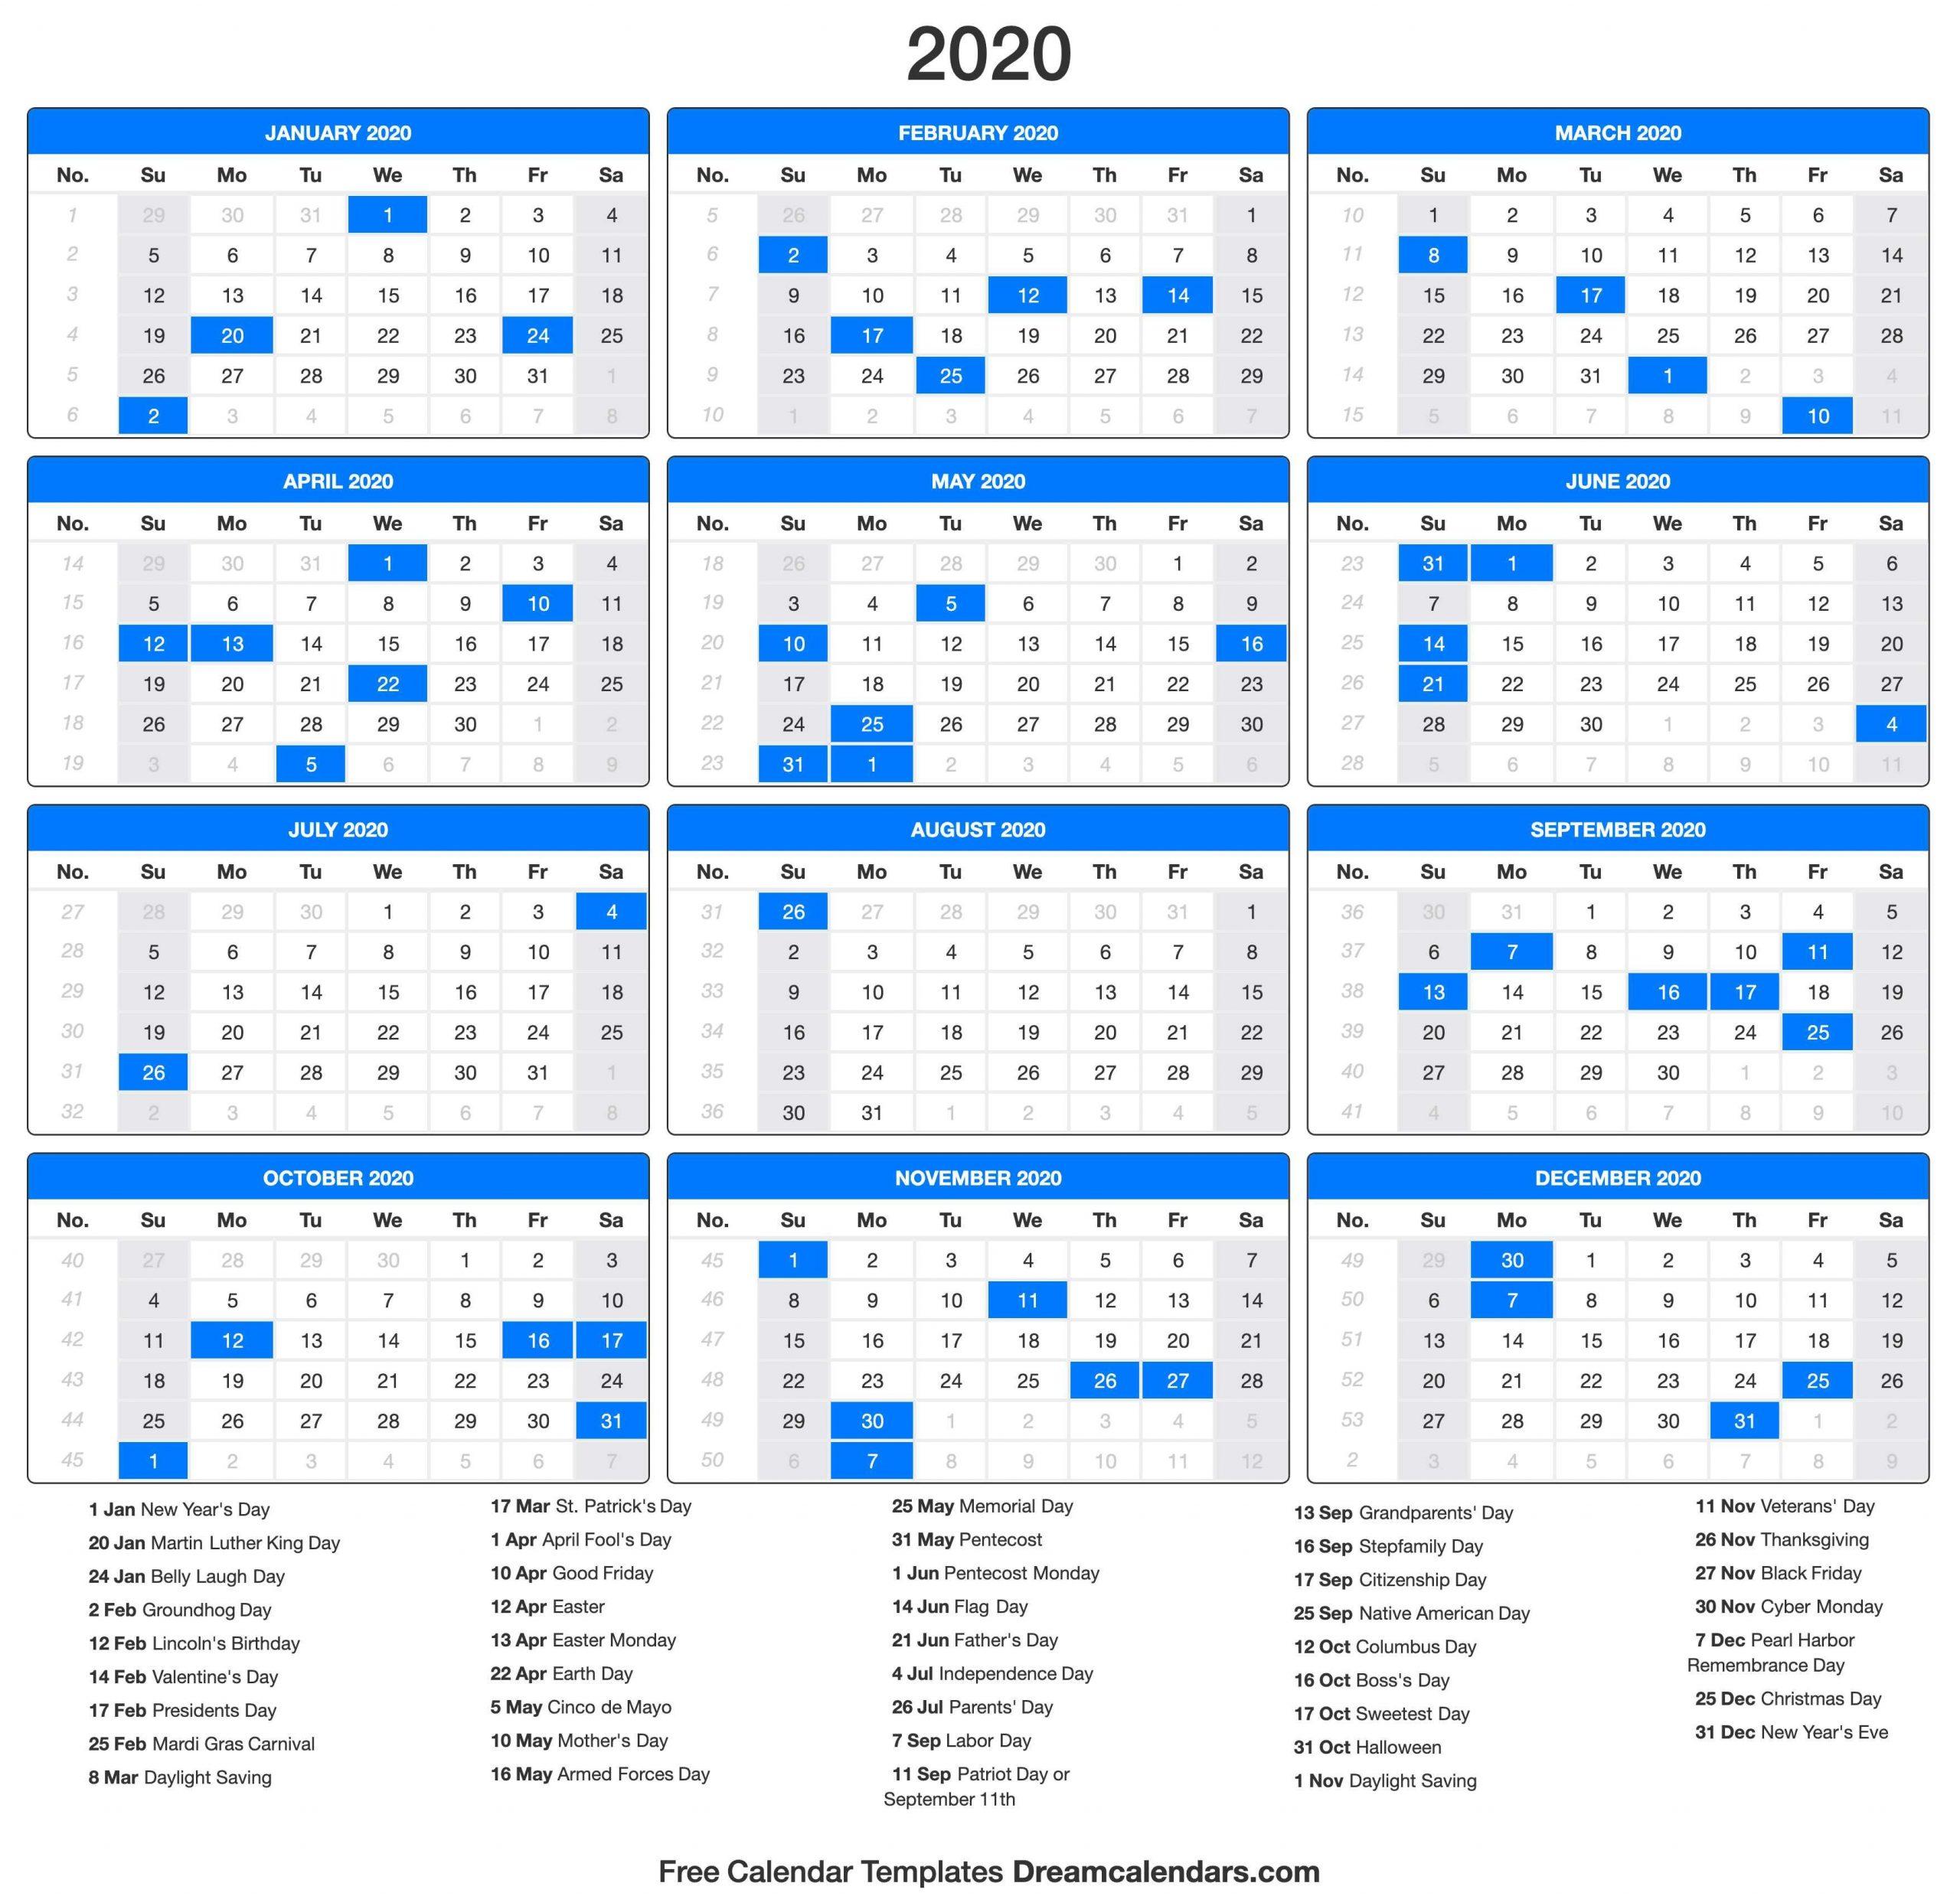 2020 Calendar Calendar With 365 Days Numbered